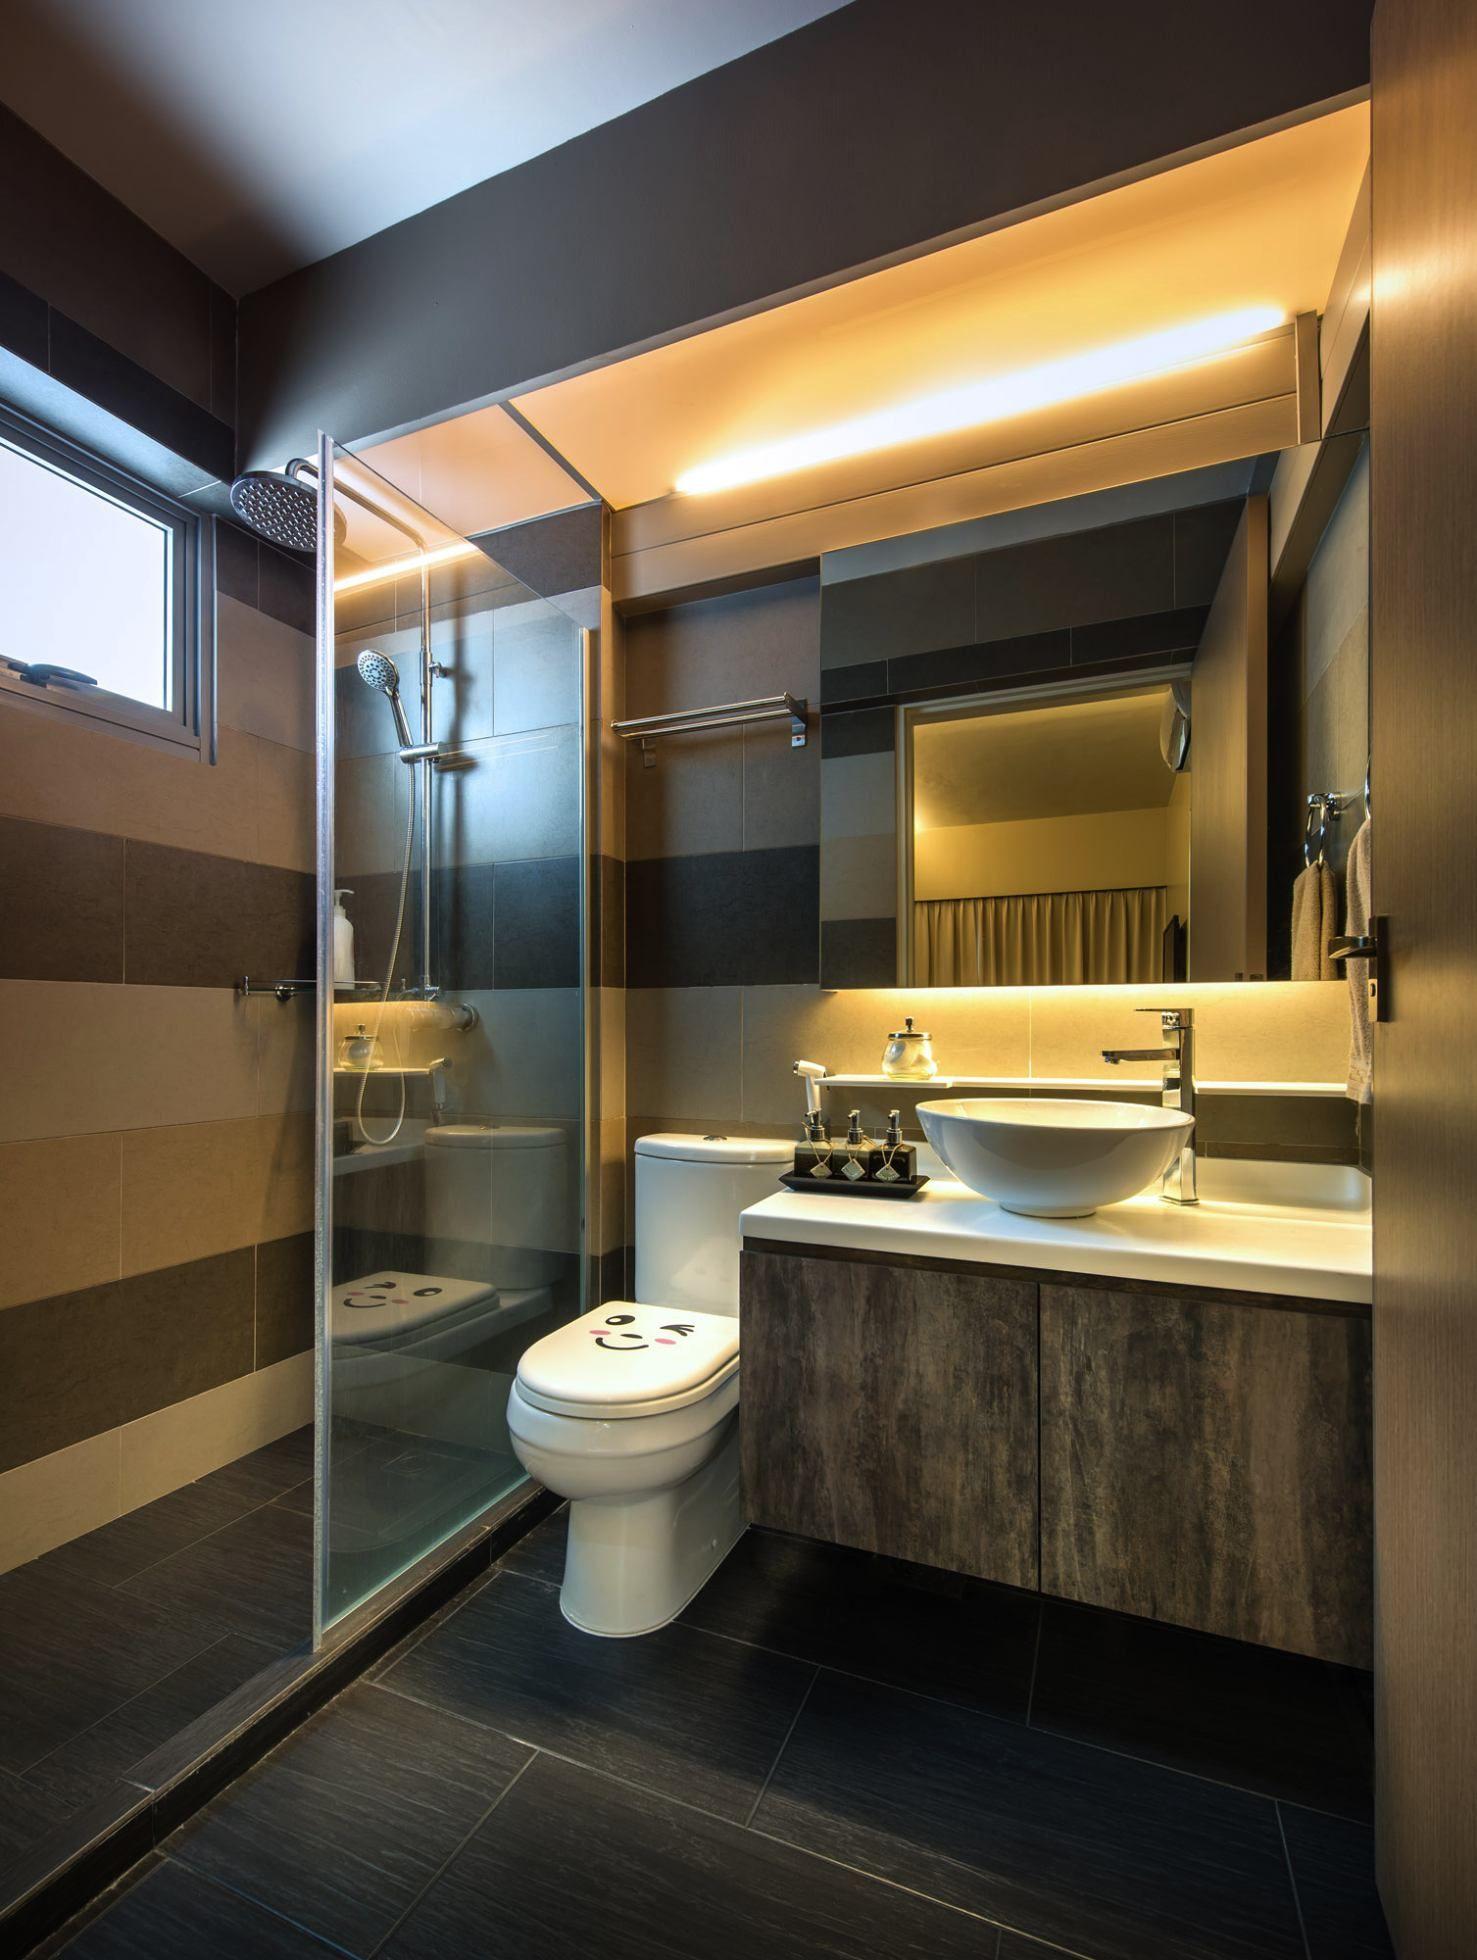 Interior Design By Rezt N Relax Of Singapore Superior 4 Ro Bathroom Design Bathroom Remodel Master Toilet Design